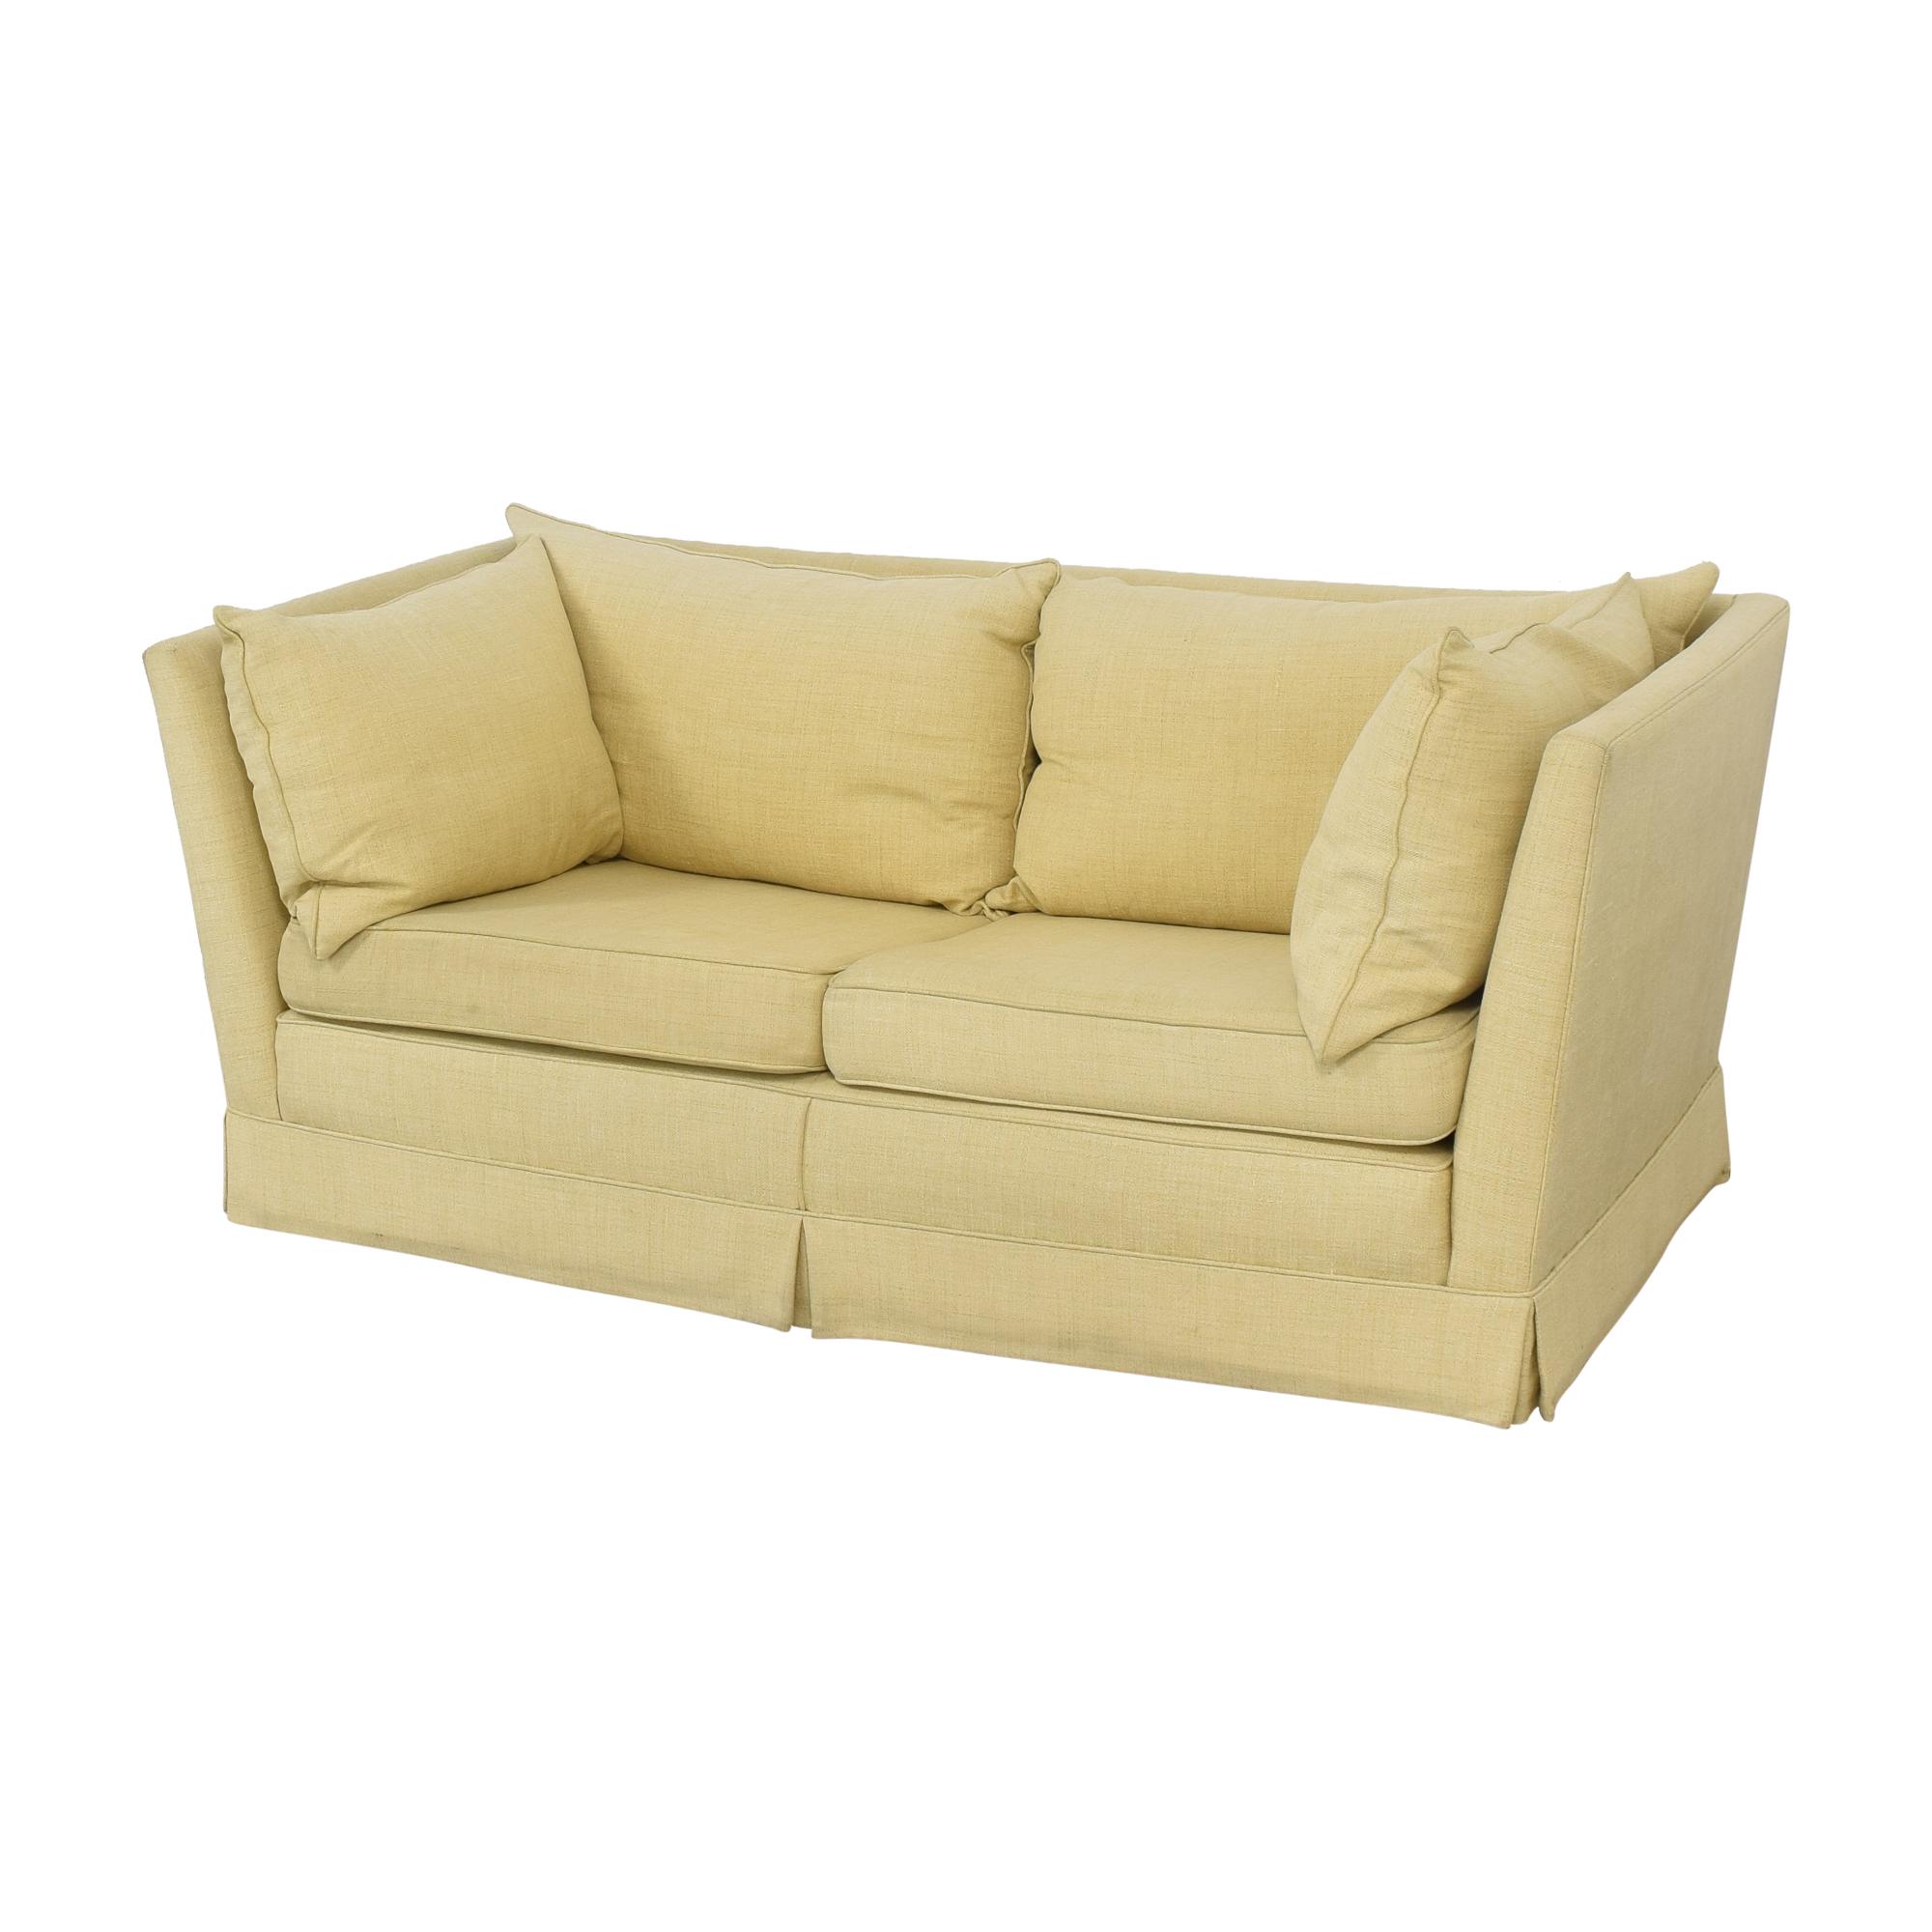 Custom Upholstered Shelter Arm Sofa used